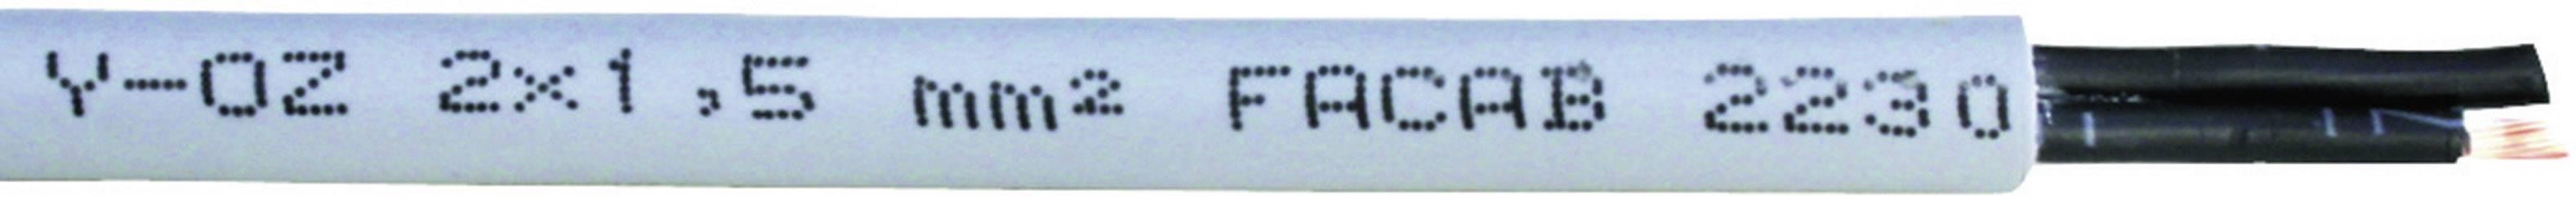 Riadiaci kábel Faber Kabel YSLY-OZ 031150, 2 x 2.50 mm², vonkajší Ø 7.70 mm, 500 V, metrový tovar, sivá